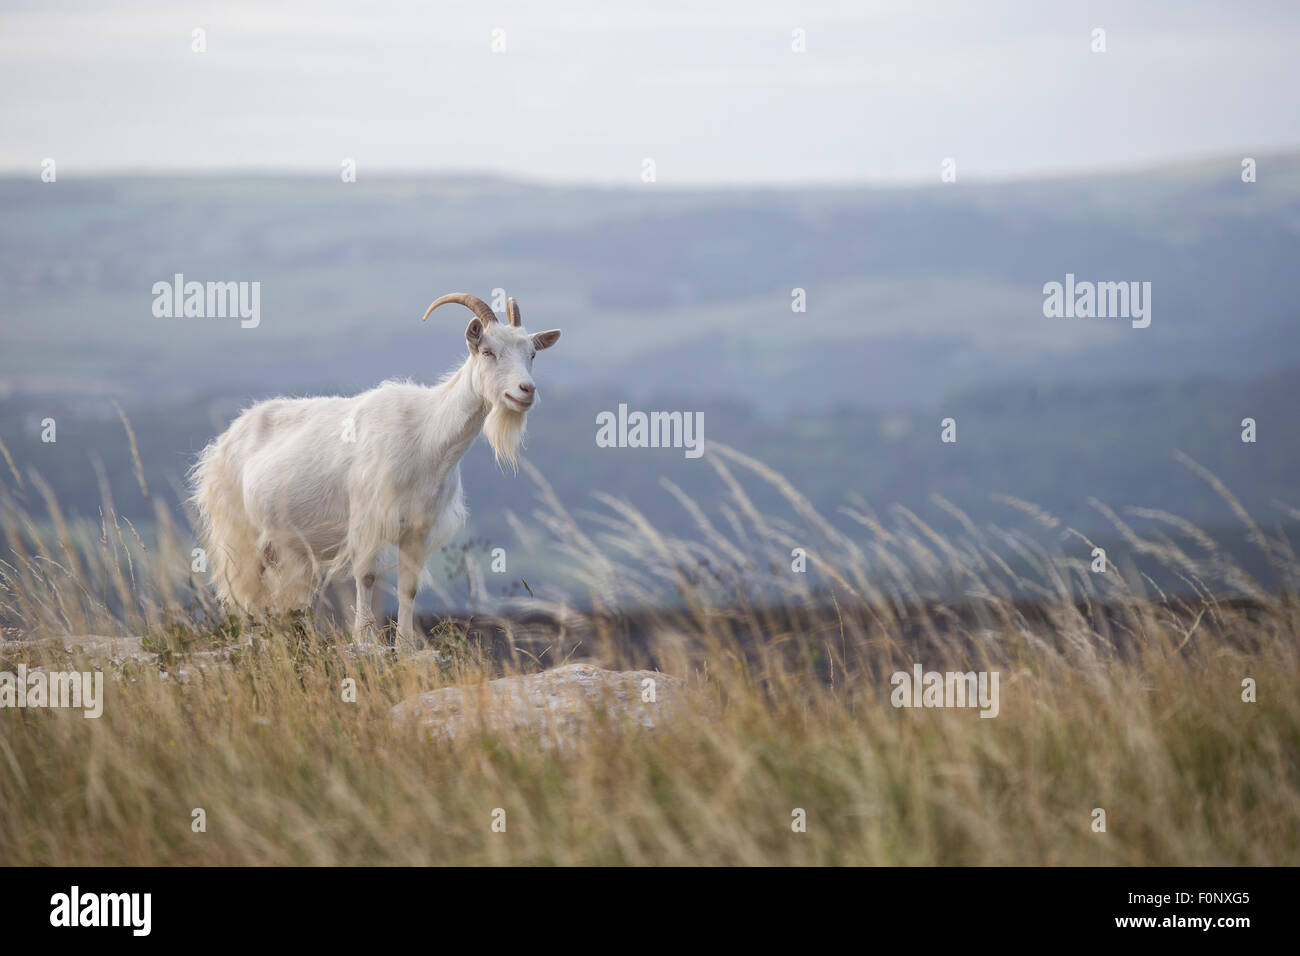 Wild Kashmiri goats Capra falconeri cashmiriensis Capra Markhor roaming the Great Orme grassland in Llandudno North - Stock Image